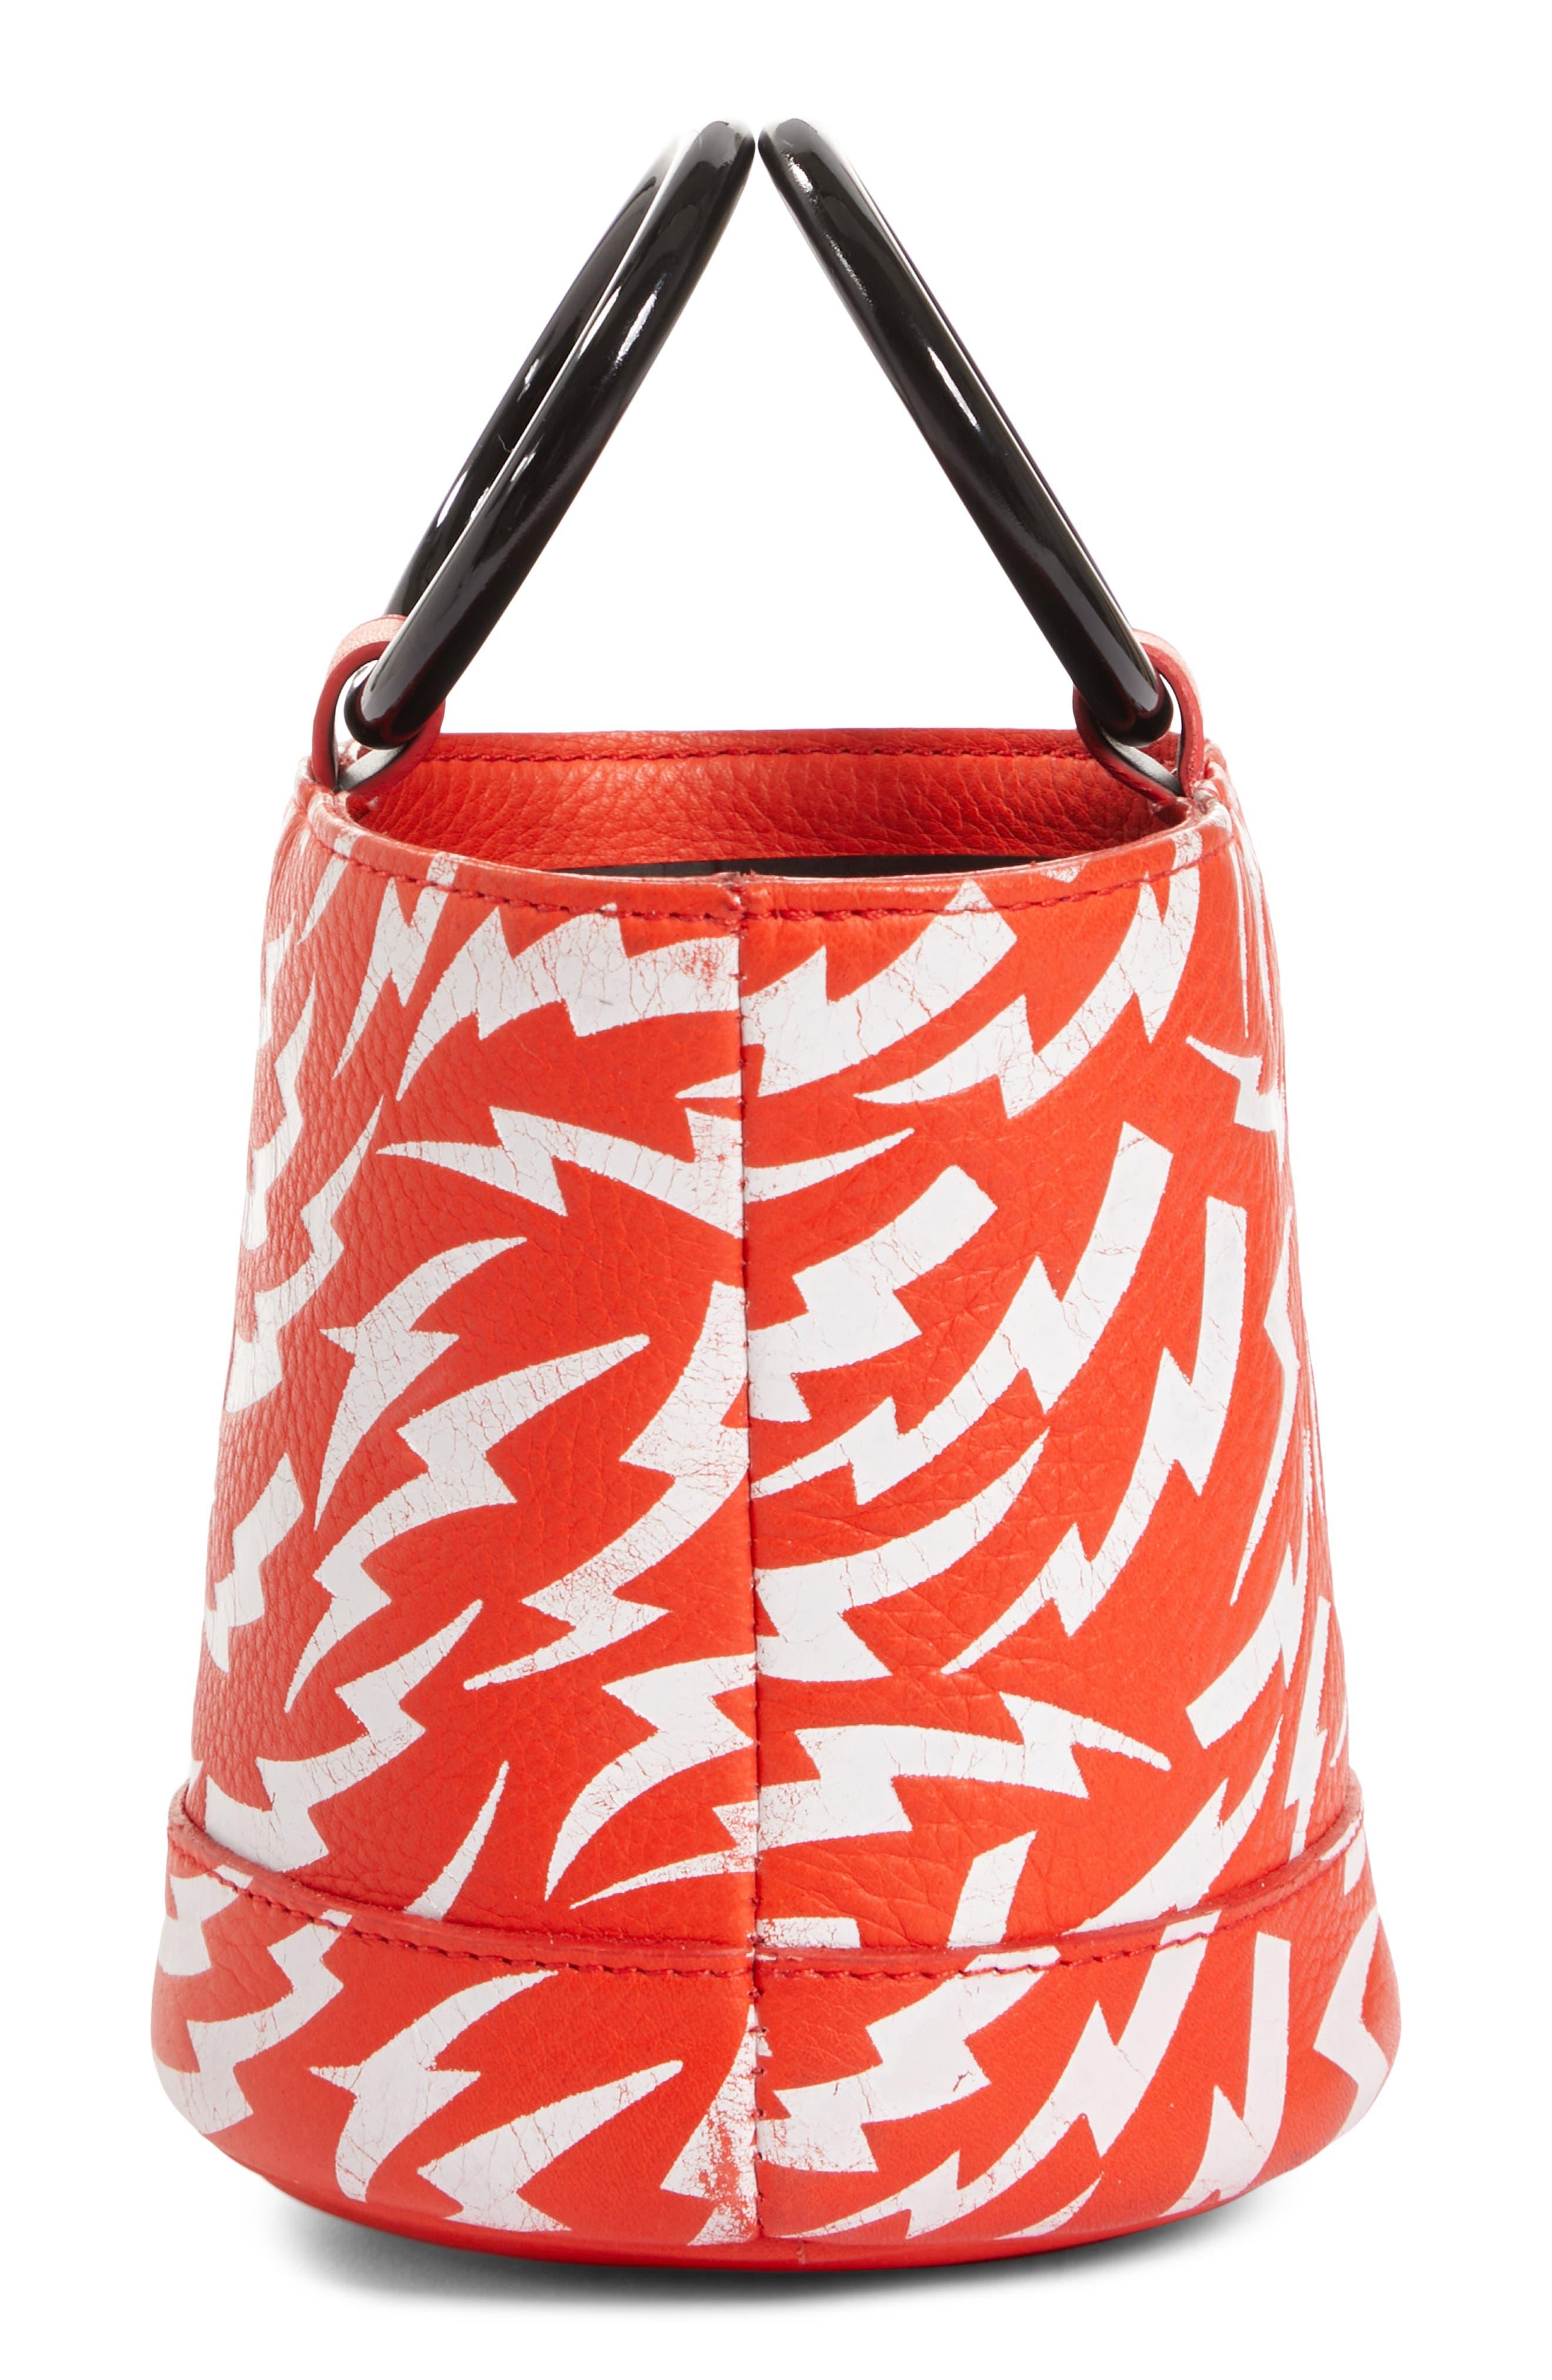 x Paramount Grease Bonsai 15 Lightning Print Bucket Bag,                             Alternate thumbnail 4, color,                             WHITE LIGHTNING BOLT